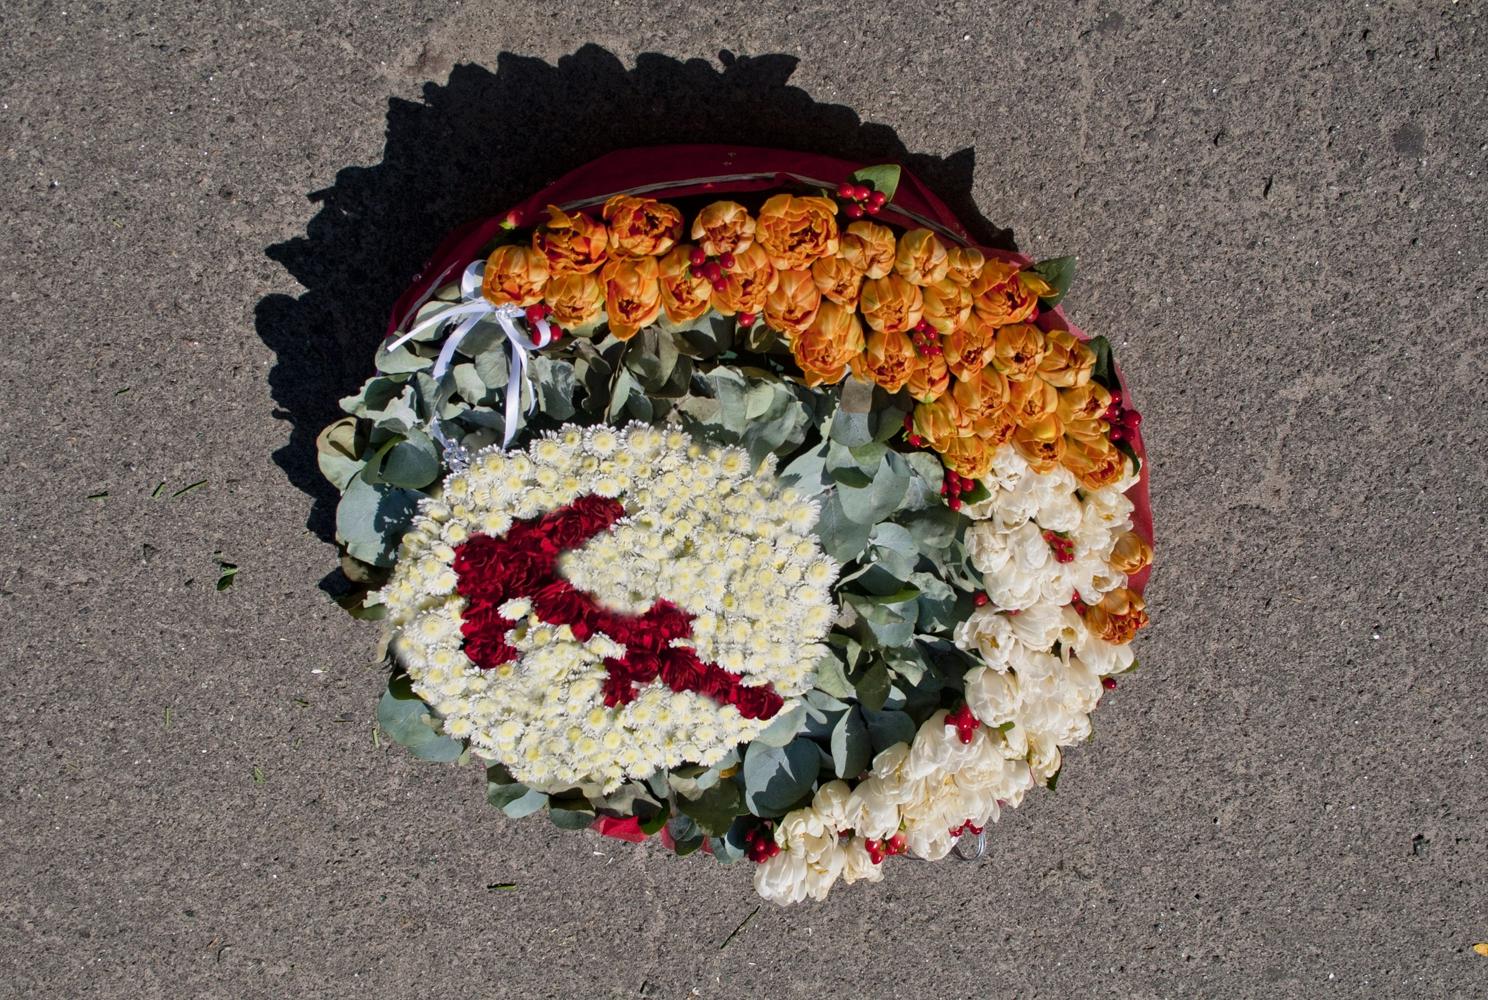 Bouquet Your sign. Sagittarius